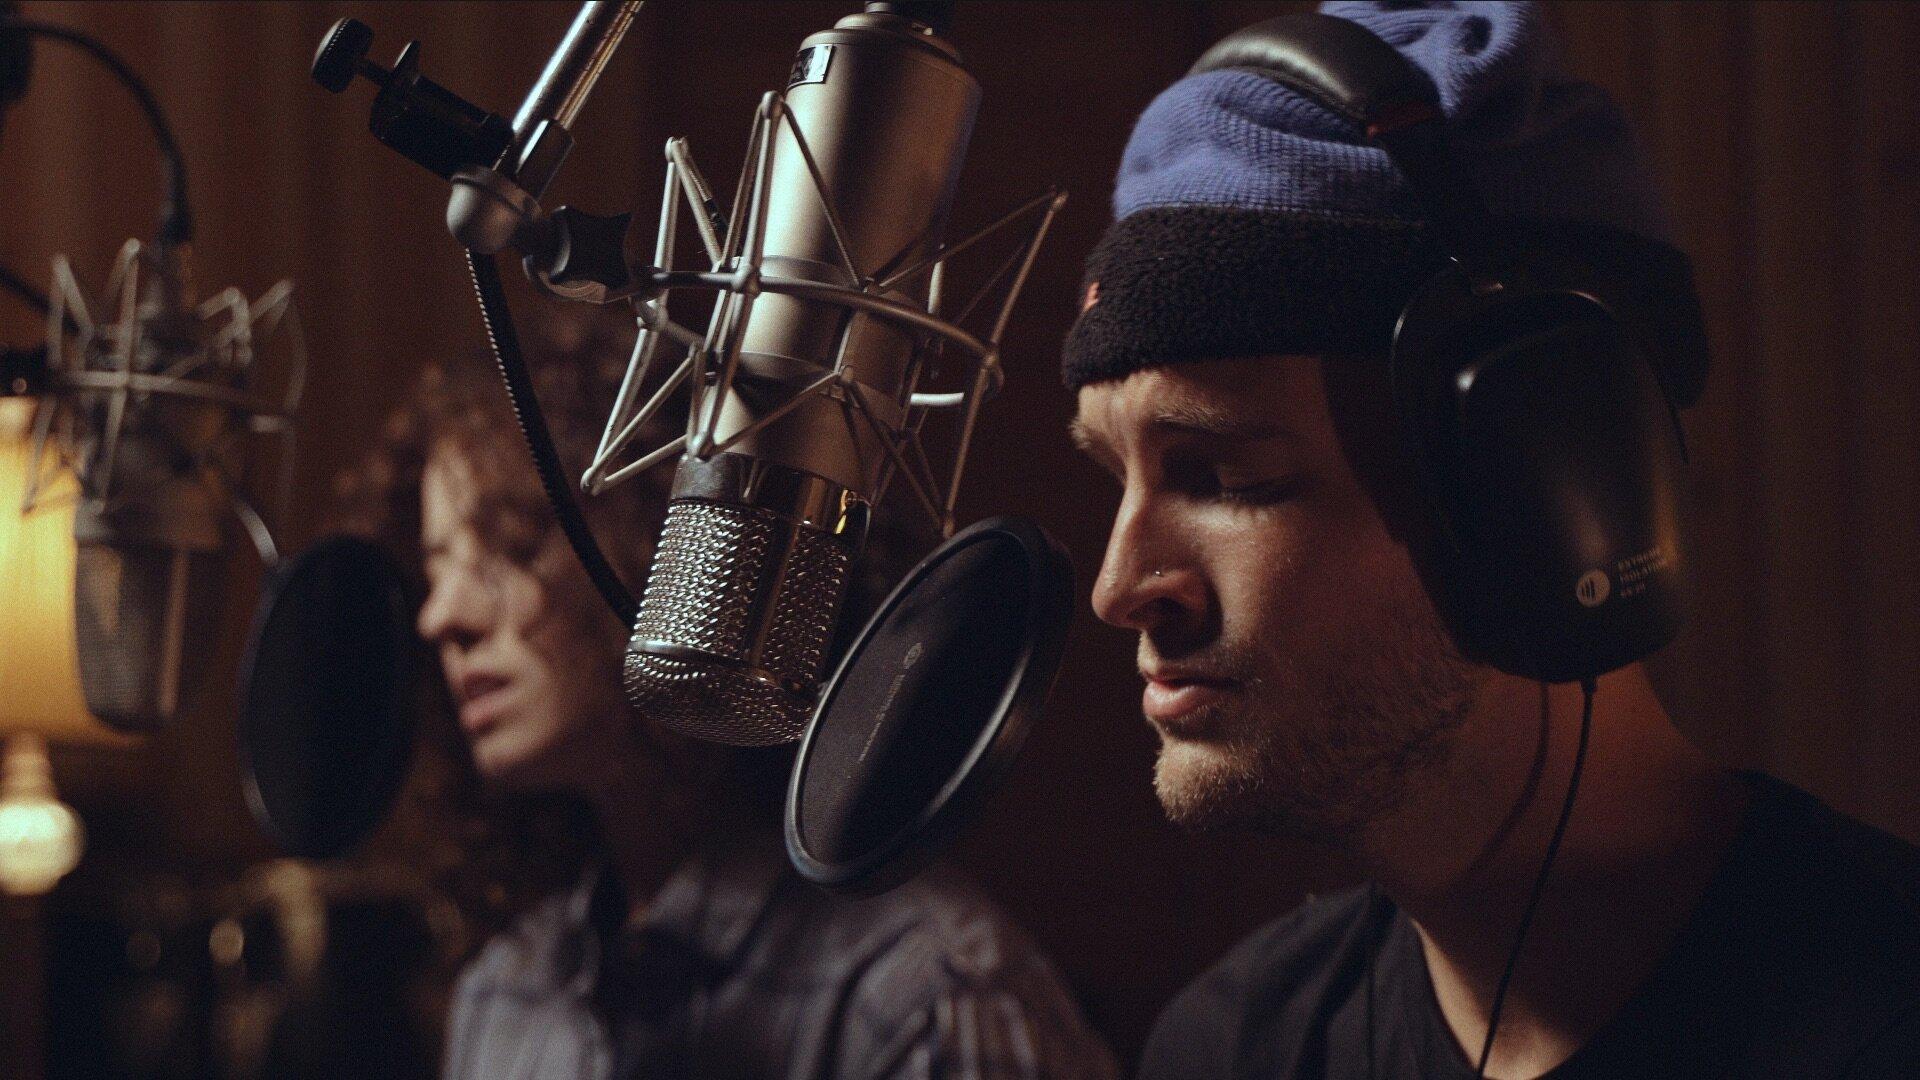 Gavin Haley feat. Sara Diamond - Show Me